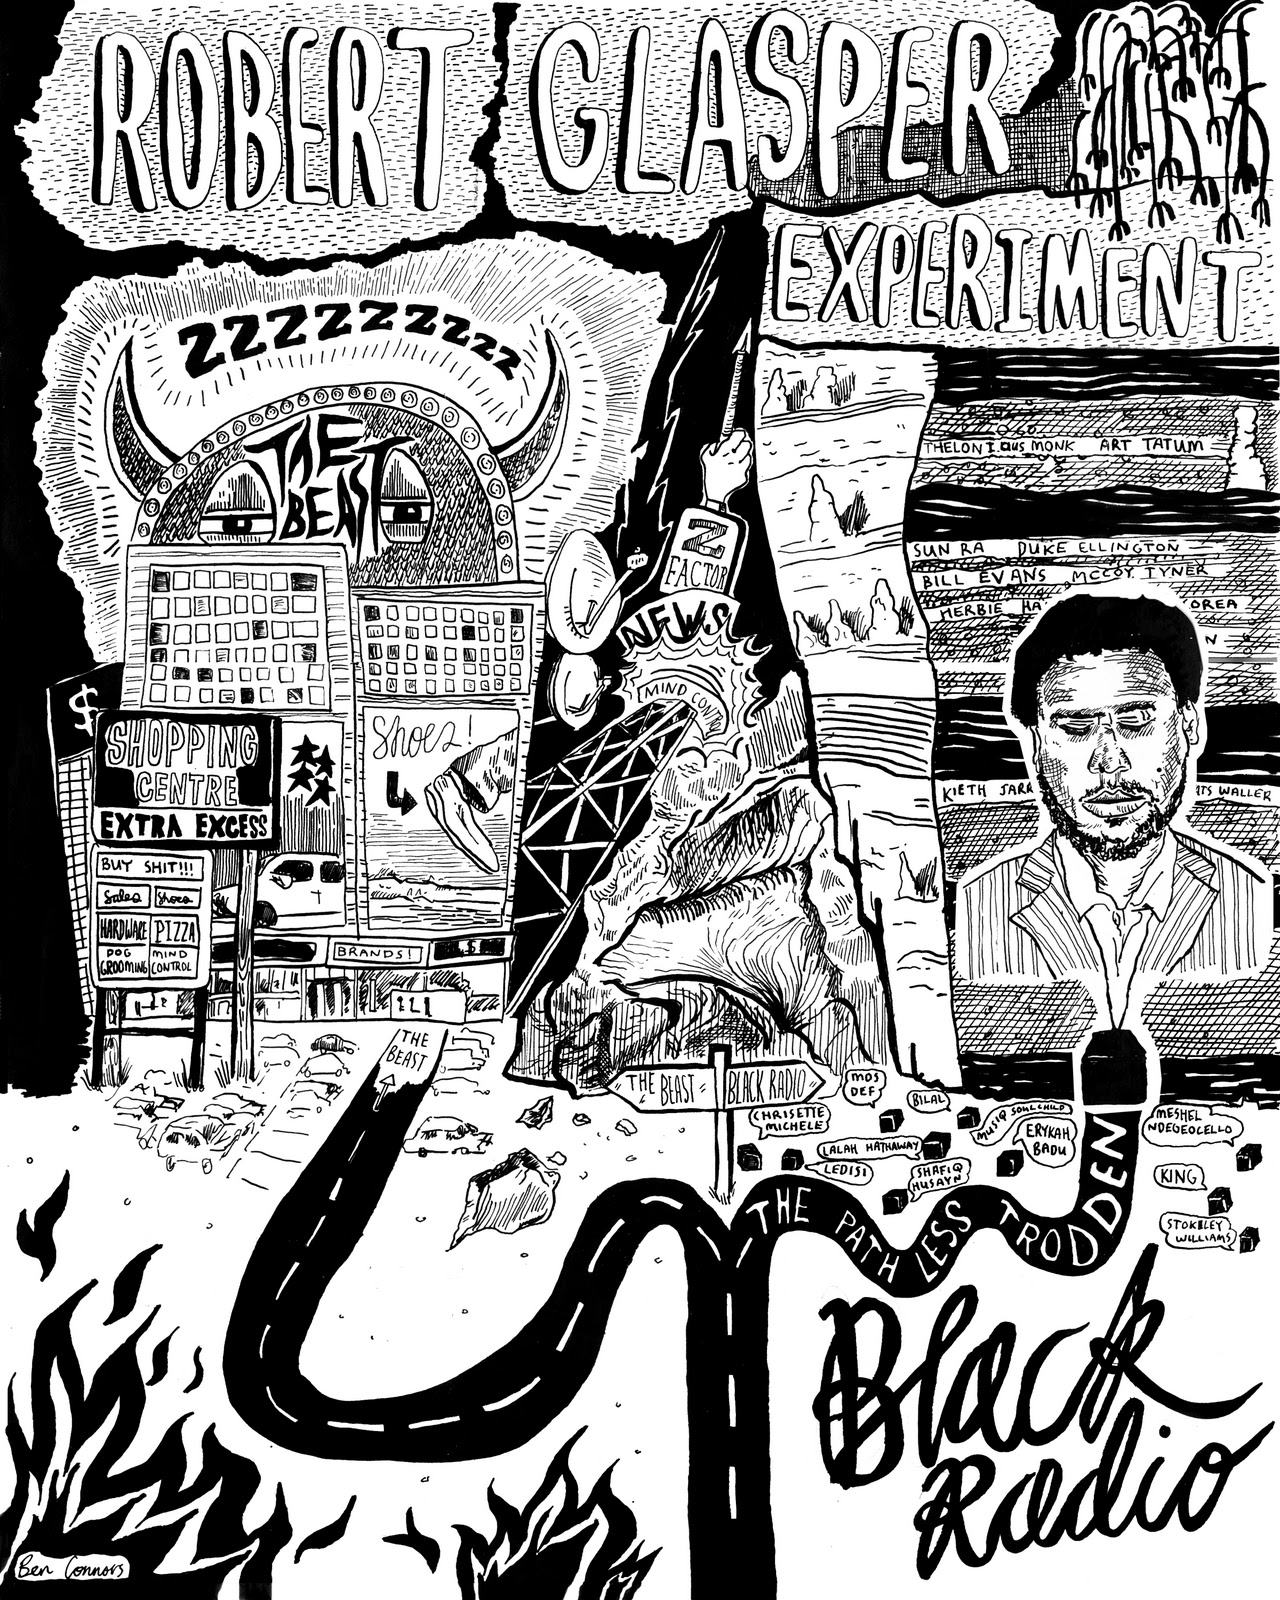 Video: Robert Glasper on his inspiration for 'Black Radio'